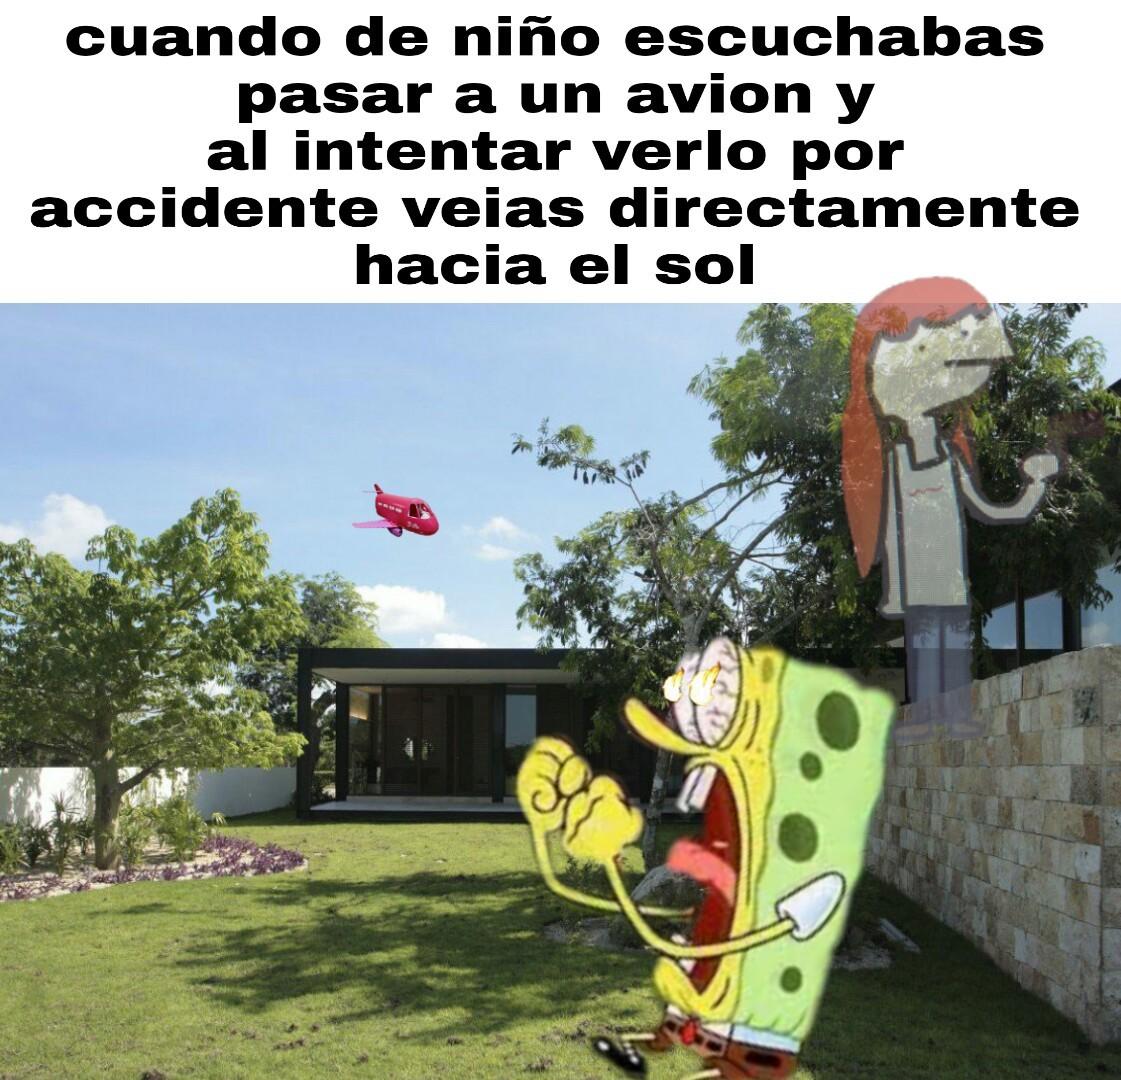 Al chile xd - meme